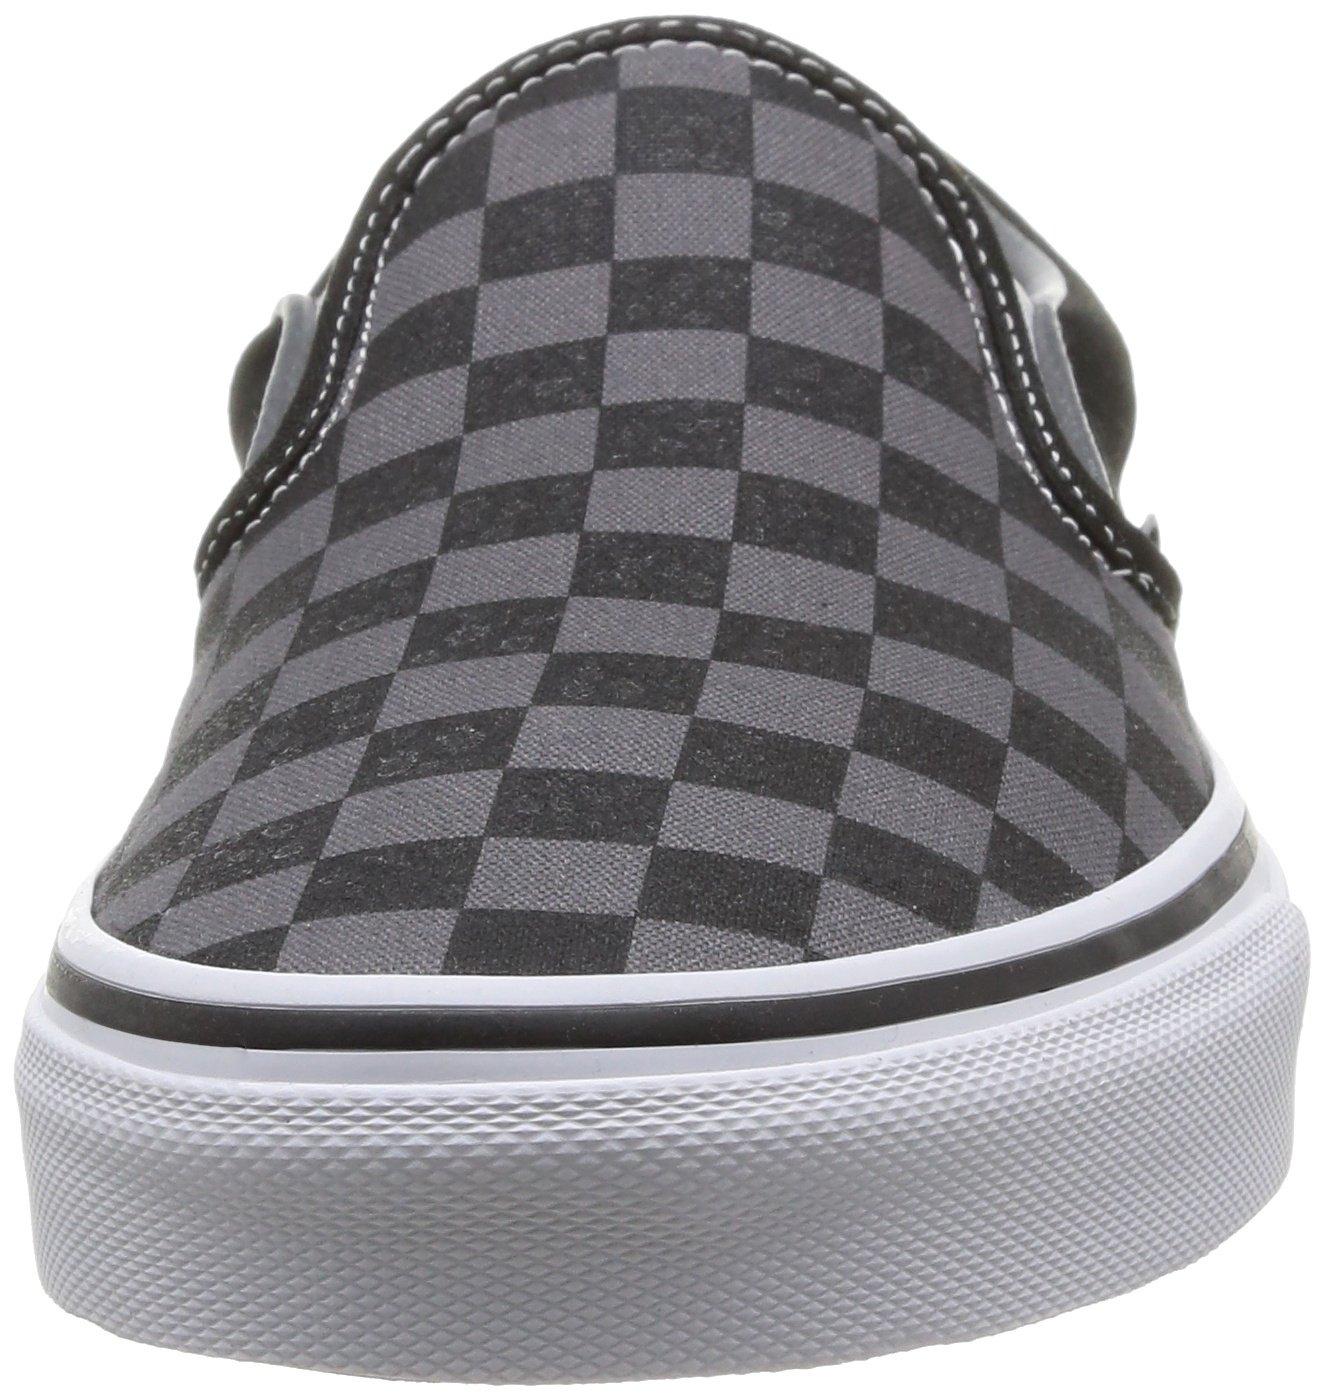 23536e65b7c Vans Classic Slip-On - VEYEBPJ   Canvas   Shoes - tibs